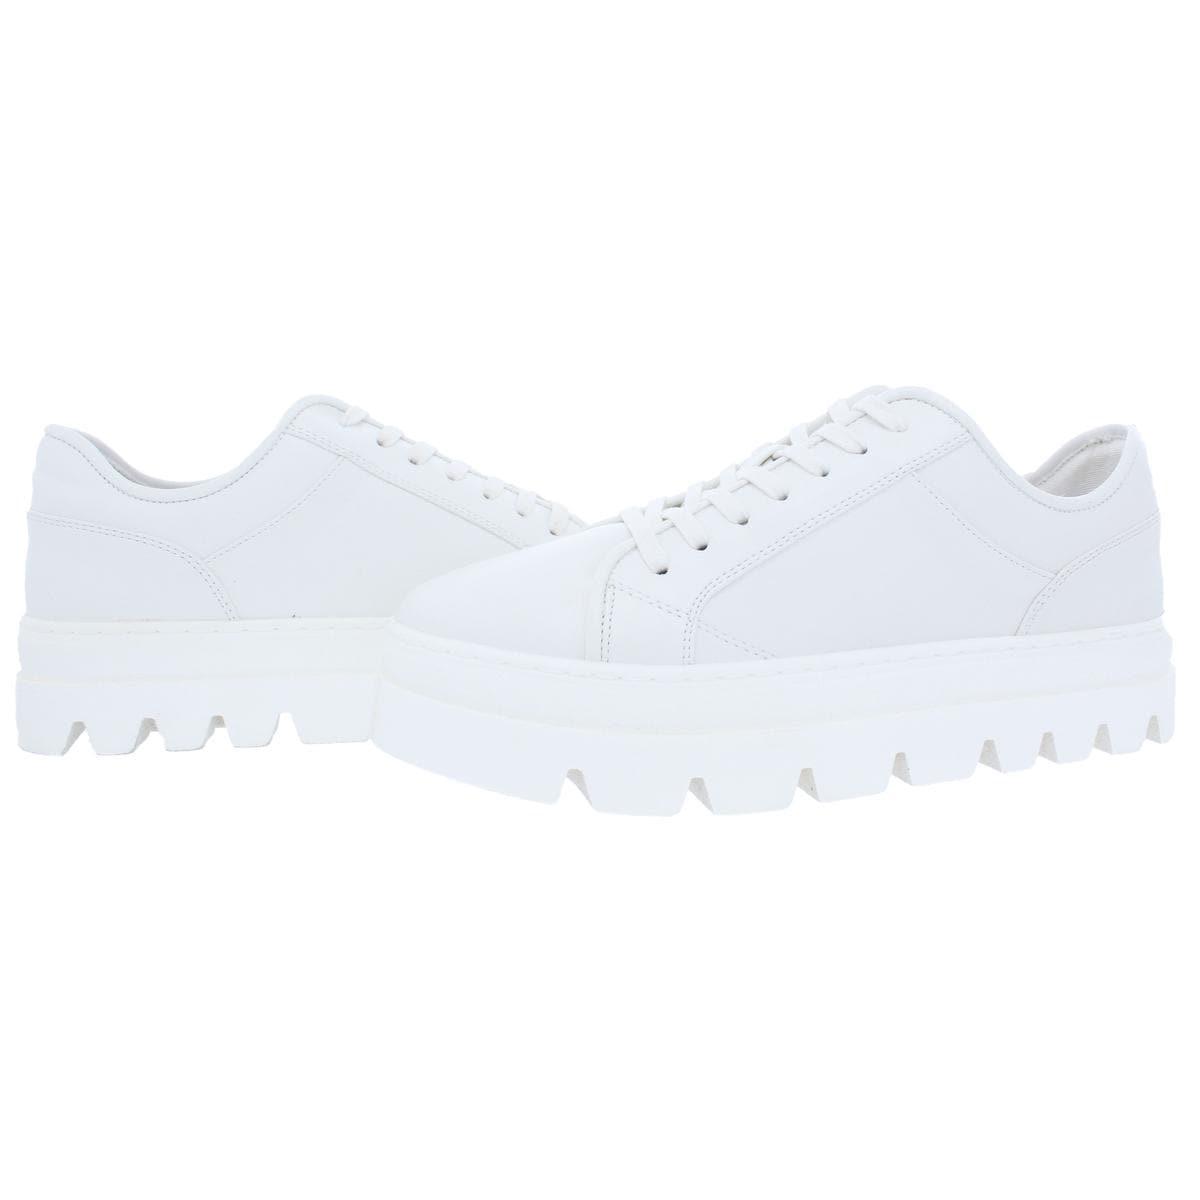 1ad1d856f3d Steve Madden Womens Kickstart Fashion Sneakers Contrast Trim Platform